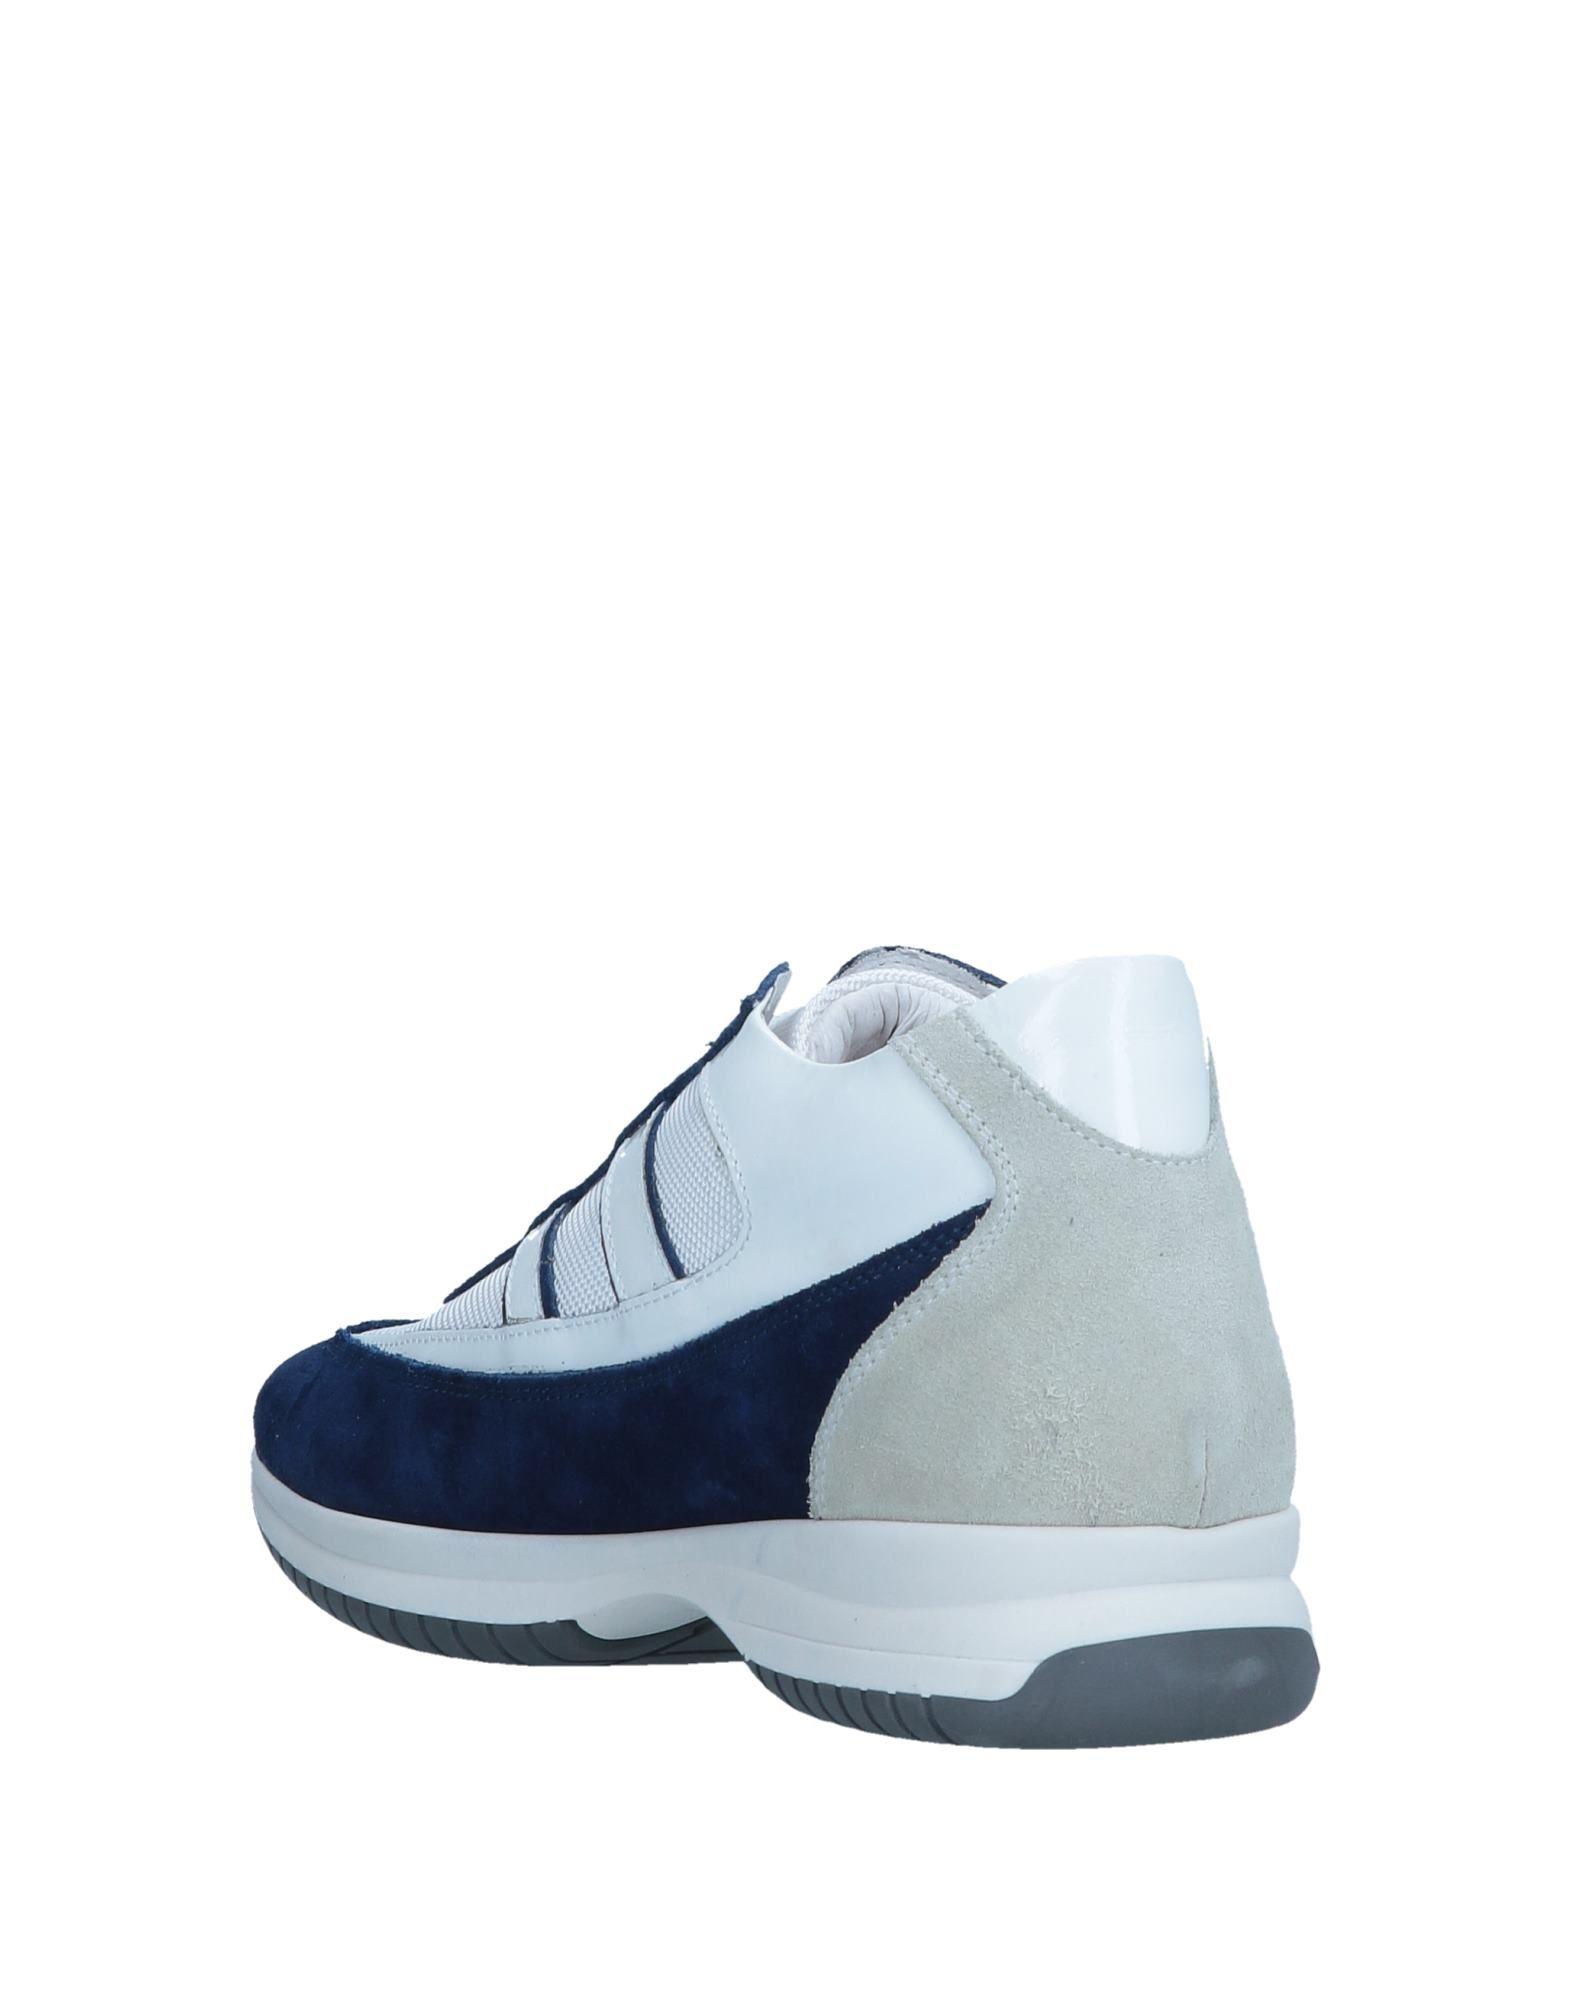 Salvo Barone Sneakers Sneakers Sneakers - Women Salvo Barone Sneakers online on  United Kingdom - 11548837WF f1b998